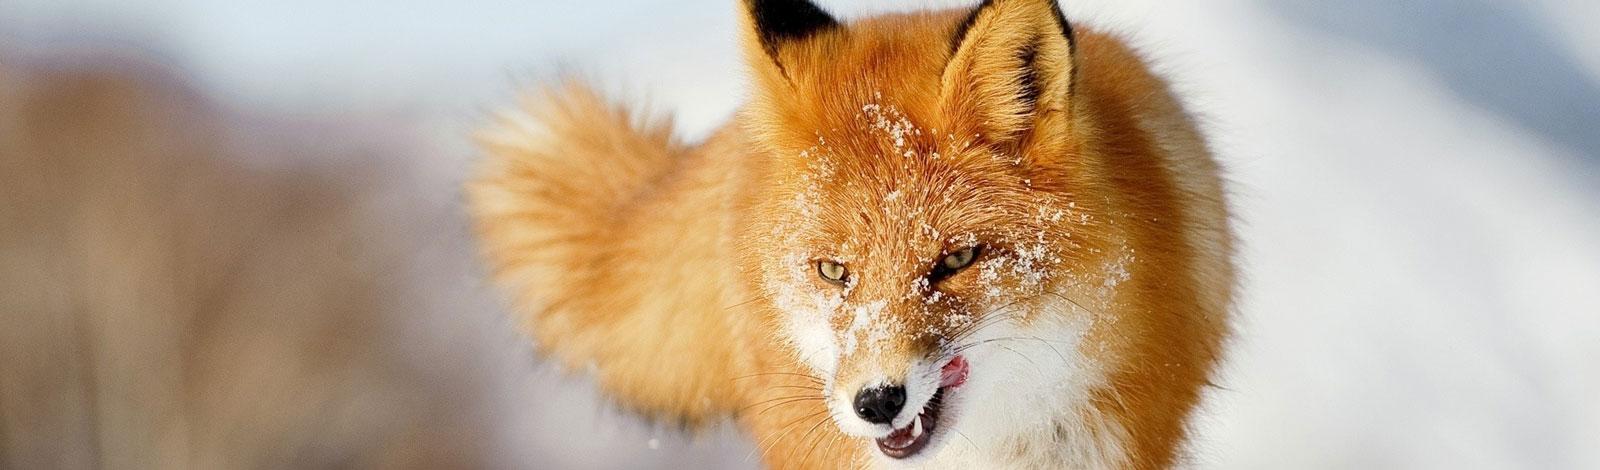 Slider-Fuchs-Winter-4